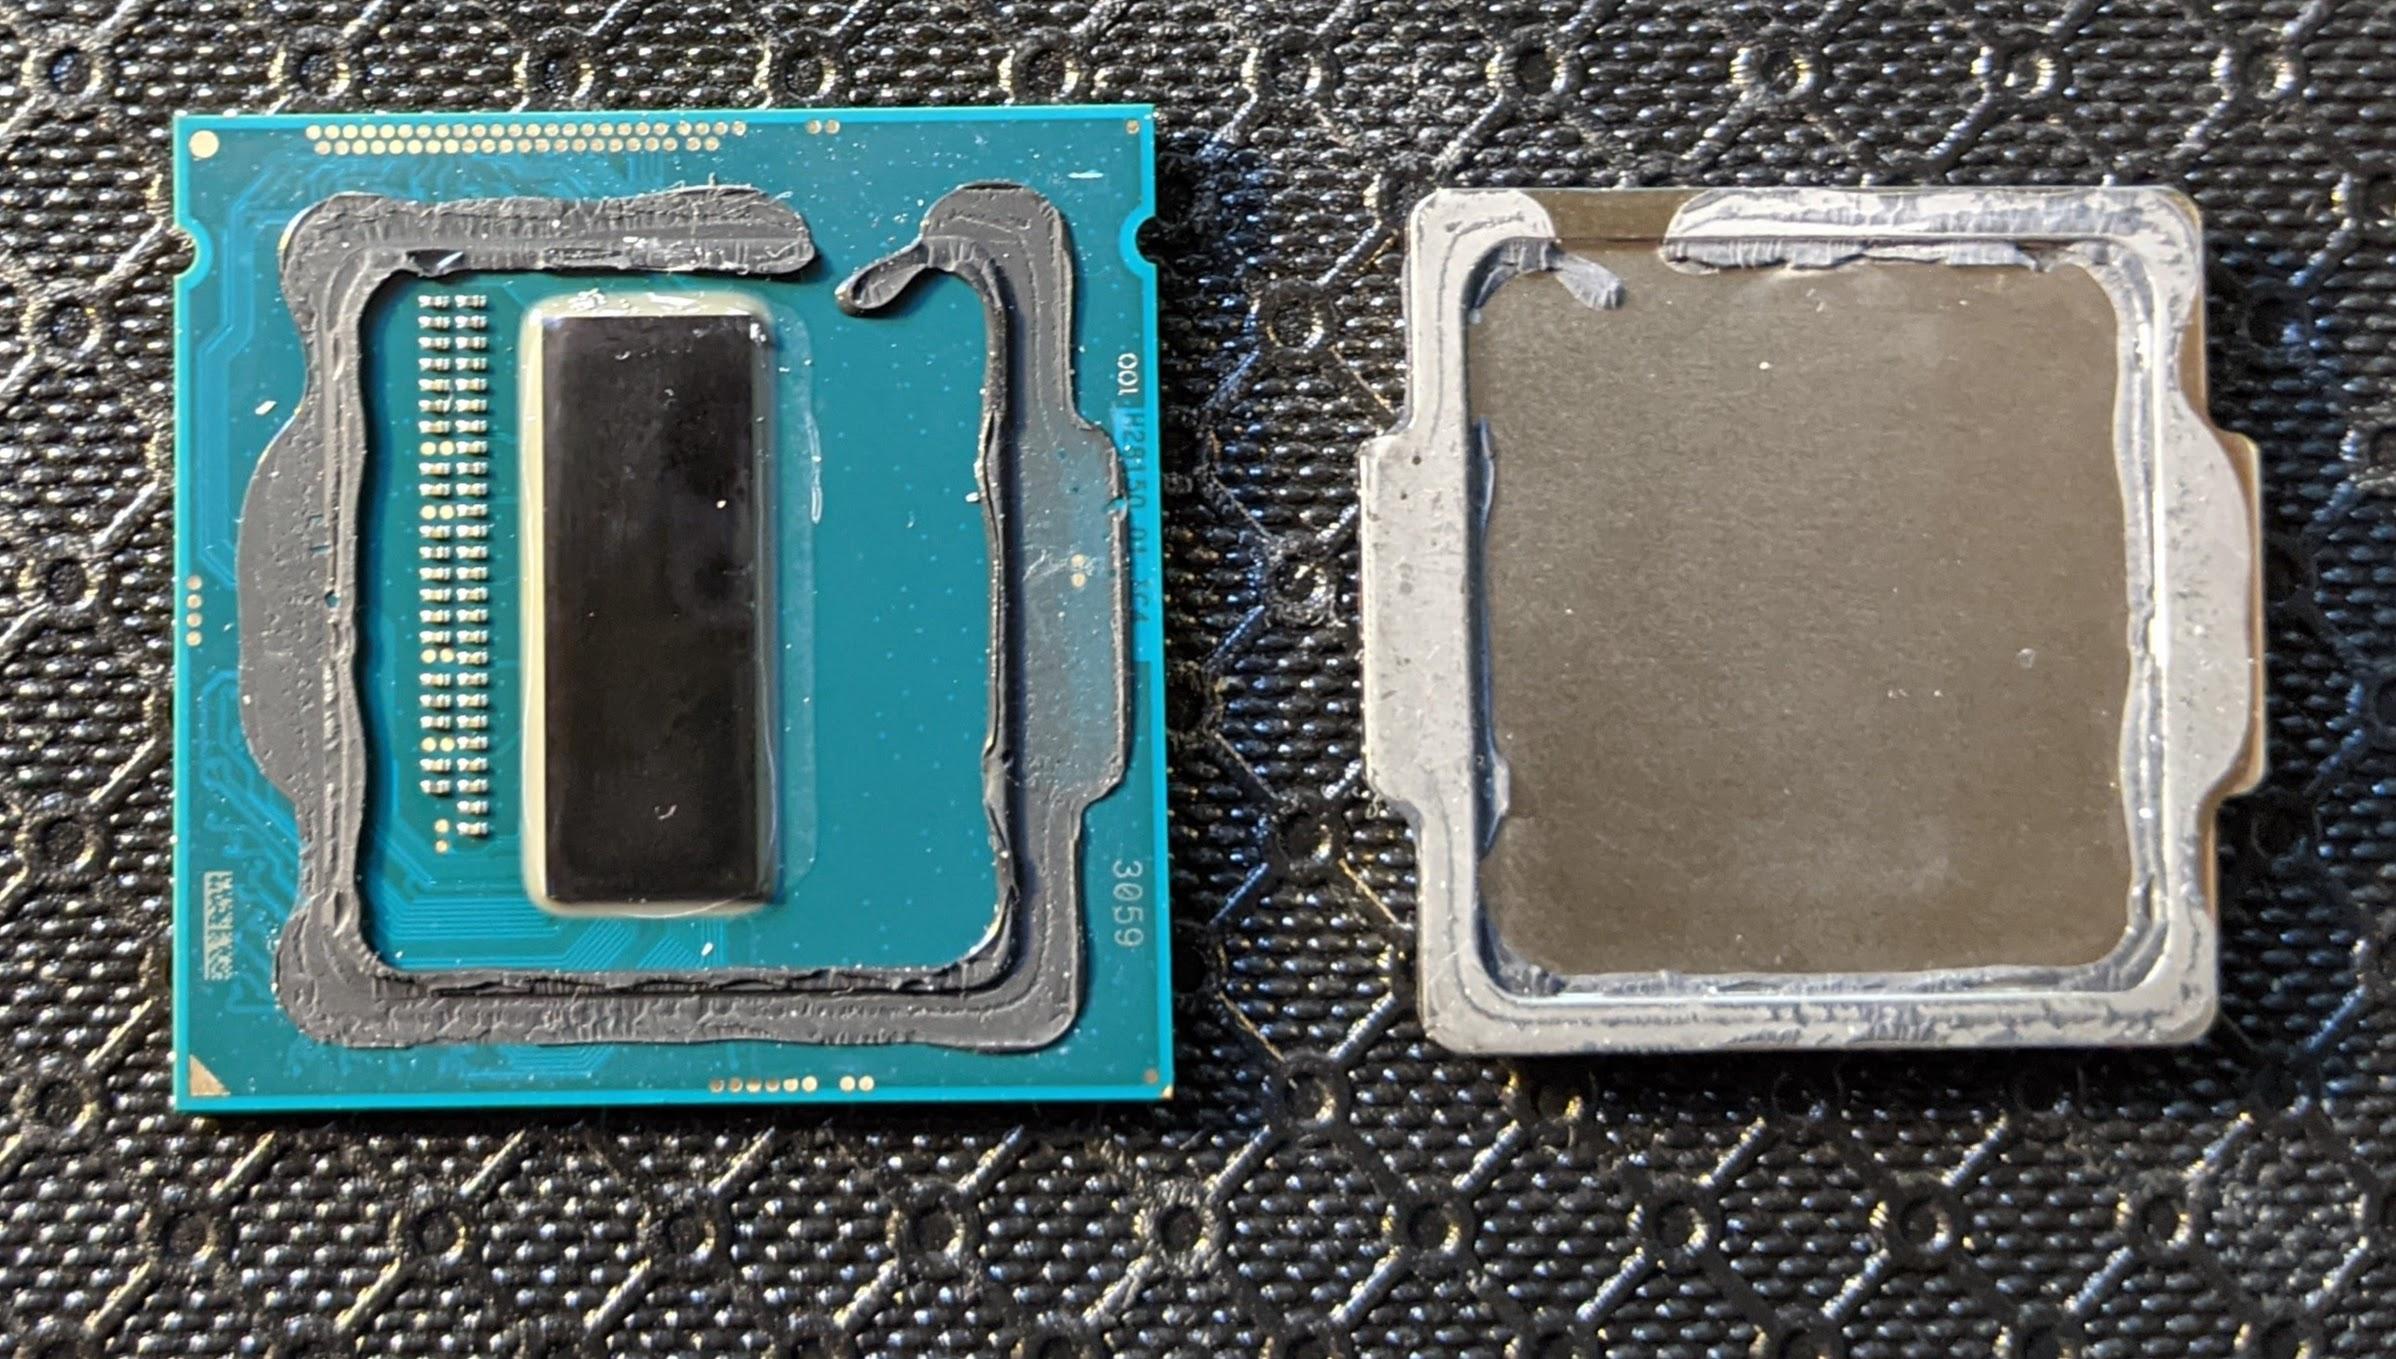 CPU delidded